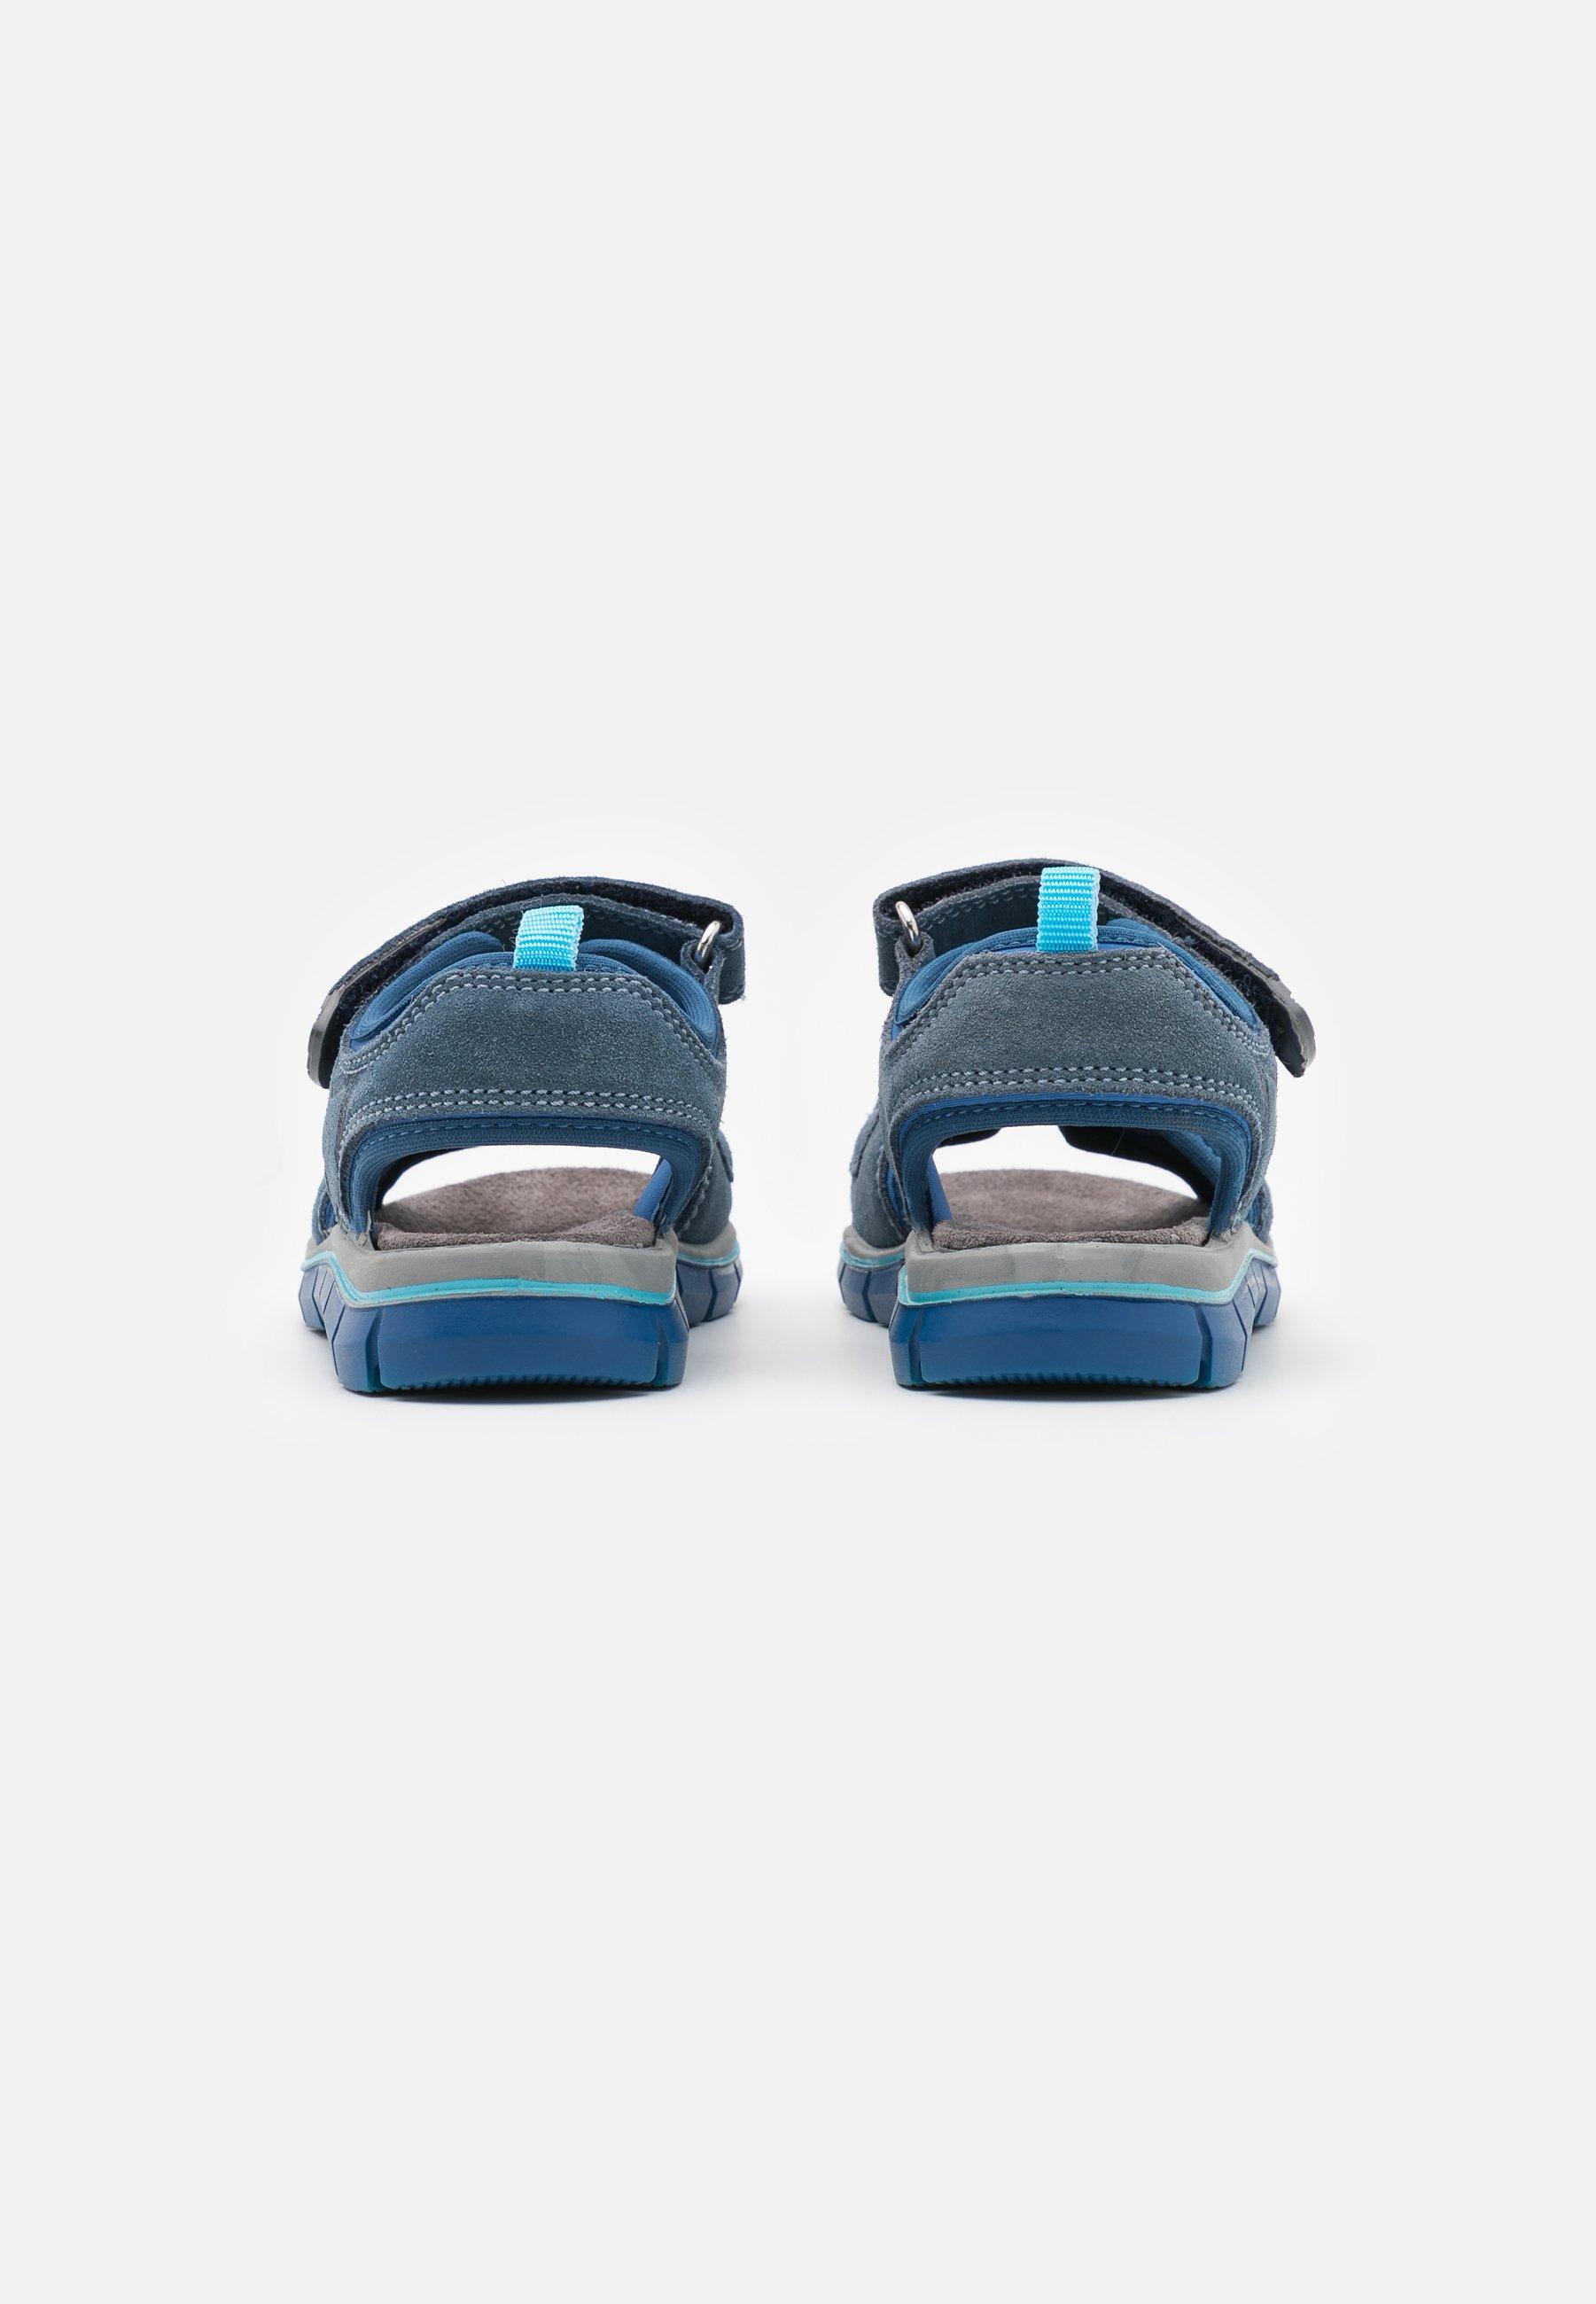 Kids Sandals